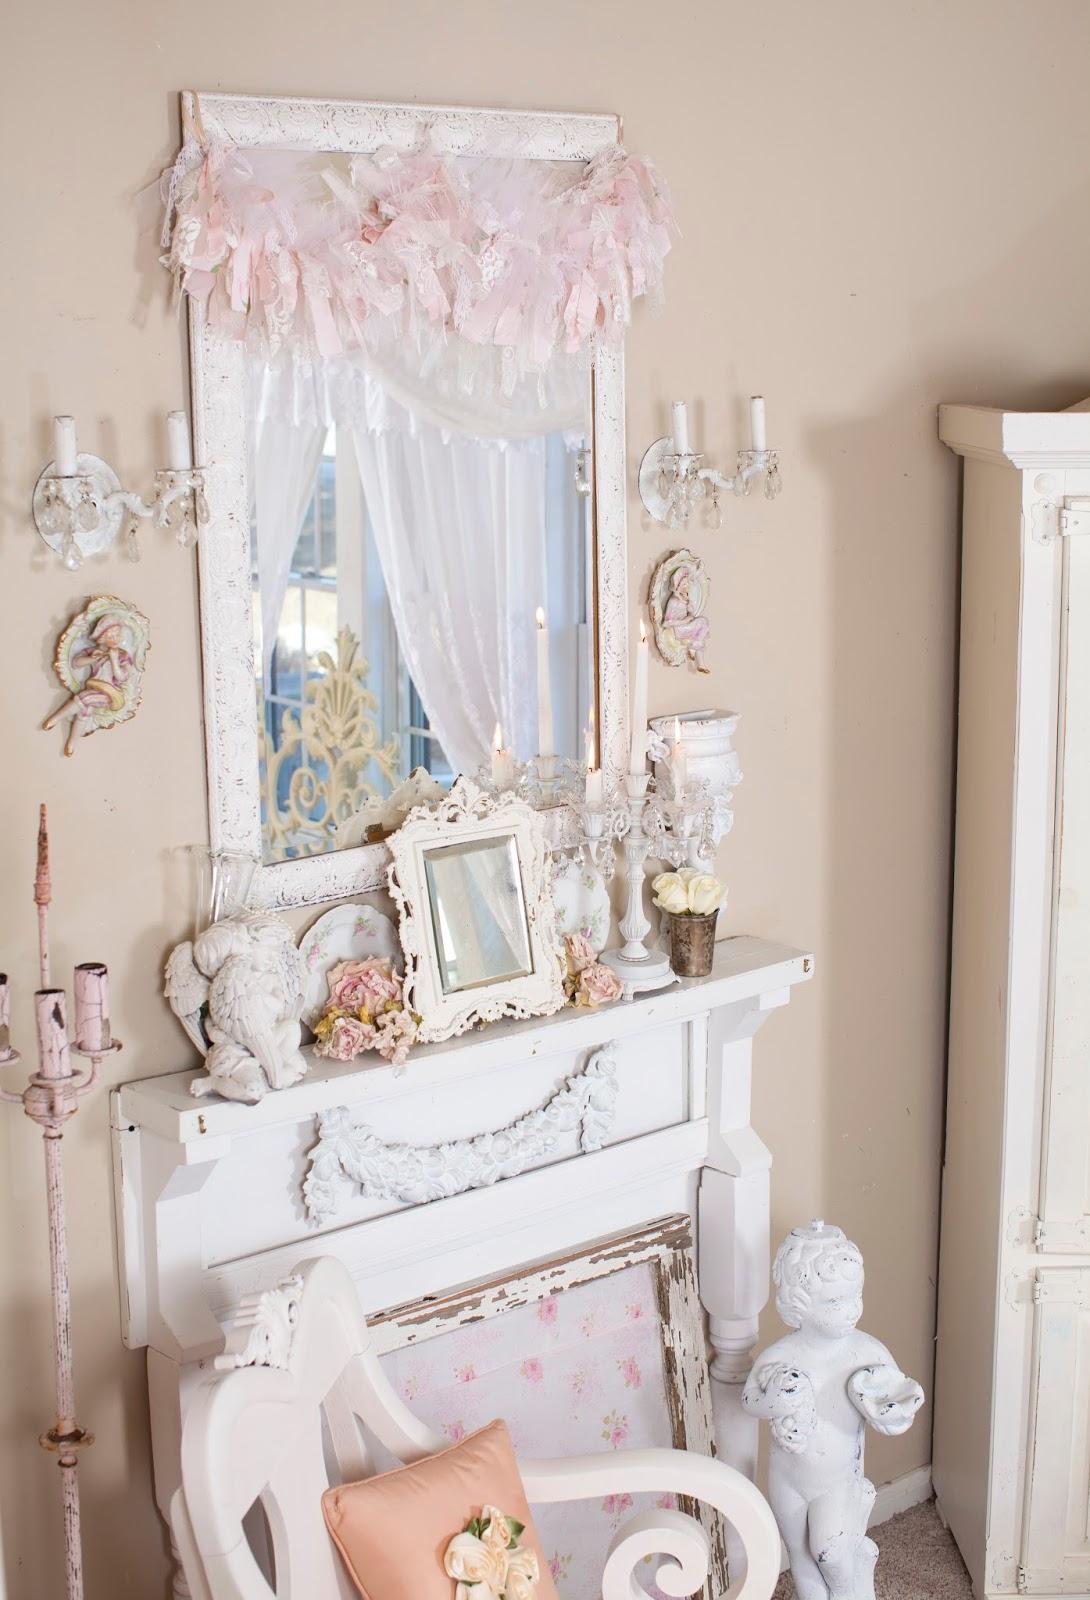 Olivia s romantic home shabby chic living room - Olivia S Romantic Home My Shabby Chic Living Room